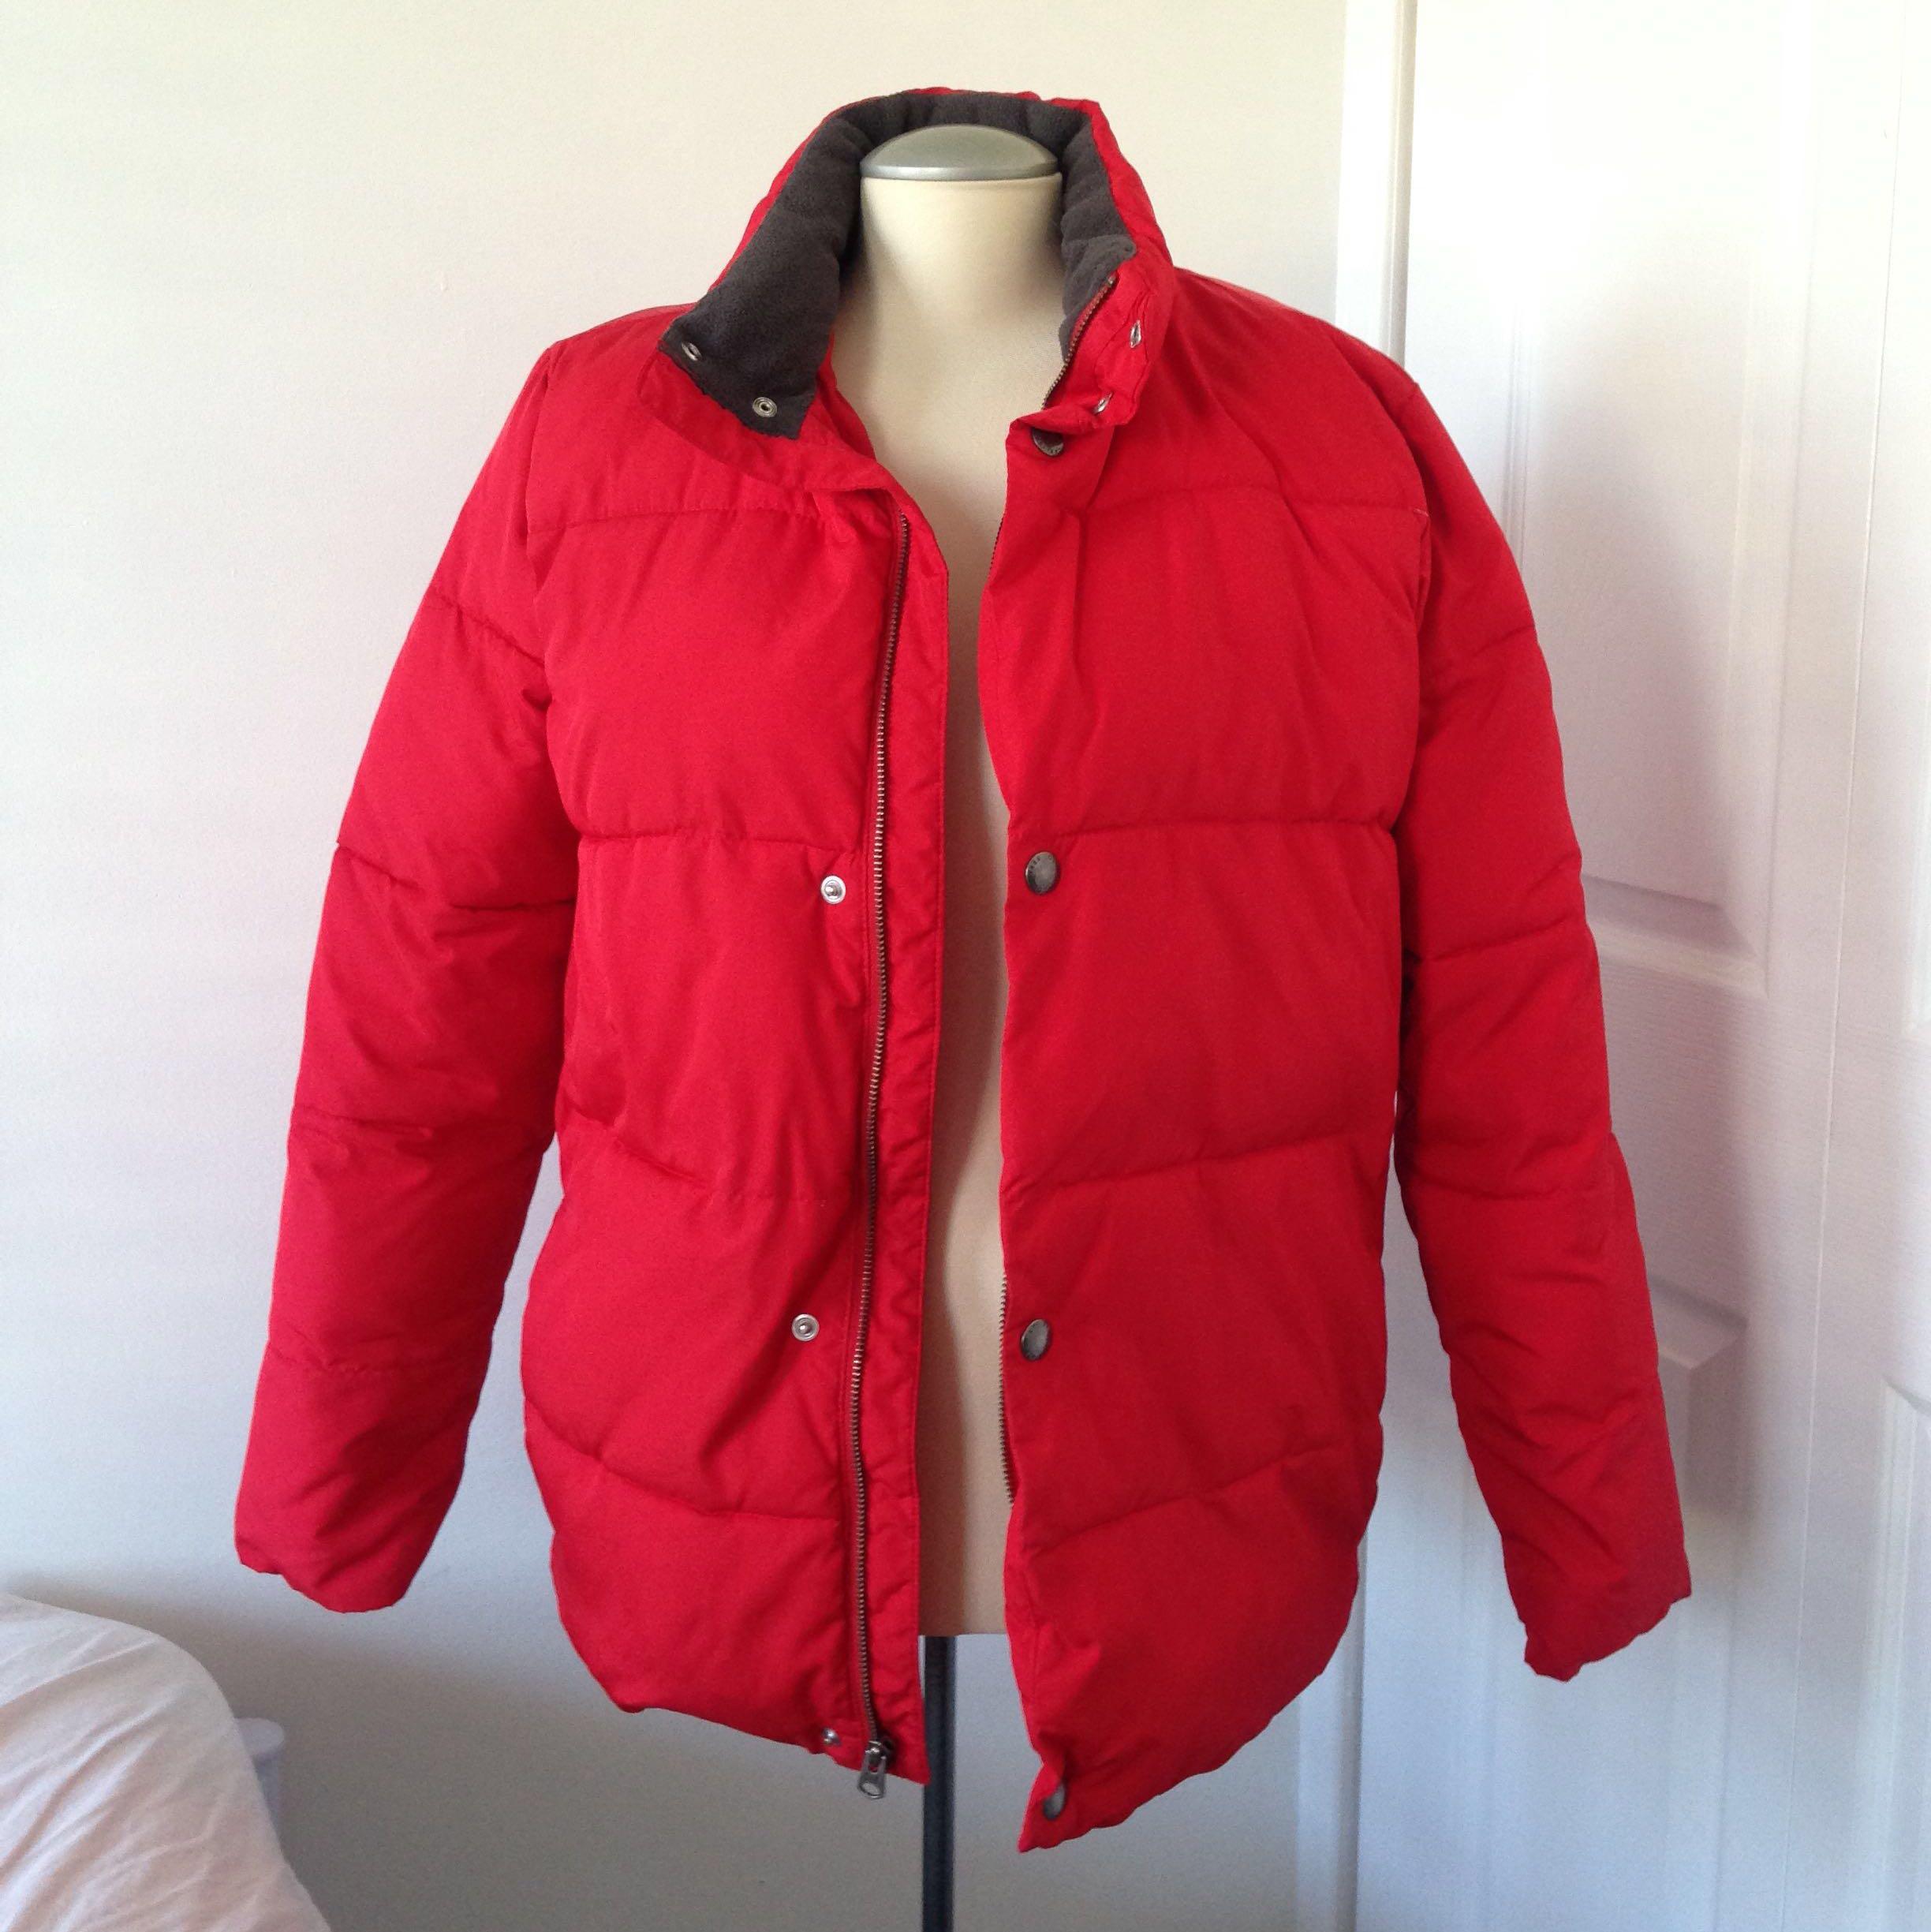 GAP red jacket